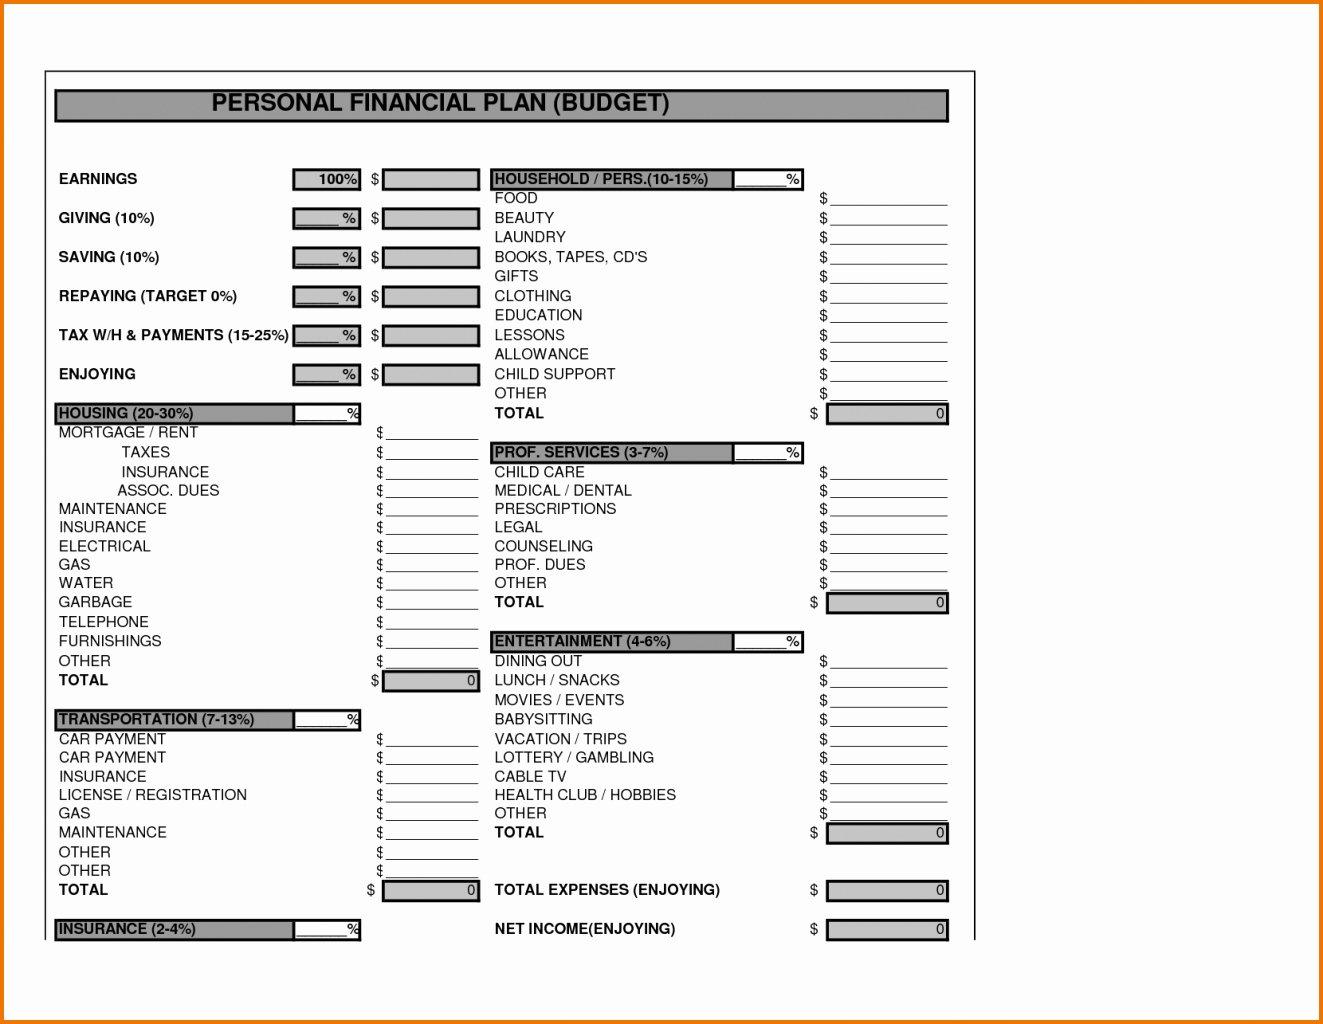 Business Financial Plan Template Excel Elegant Business Plan Financial Template Expense Spreadshee